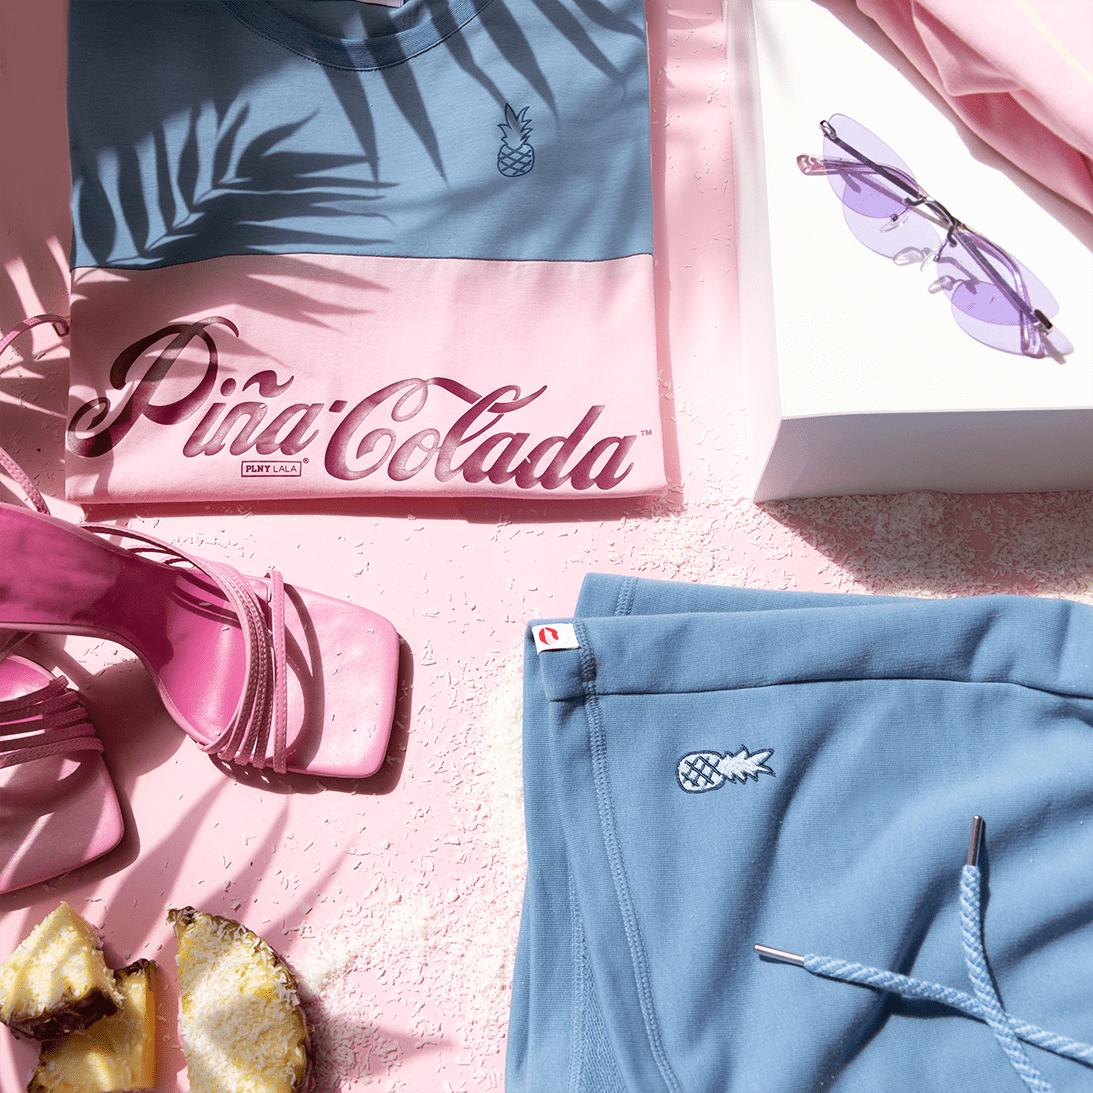 Kolekcja Pina Colada marki PLNY LALA